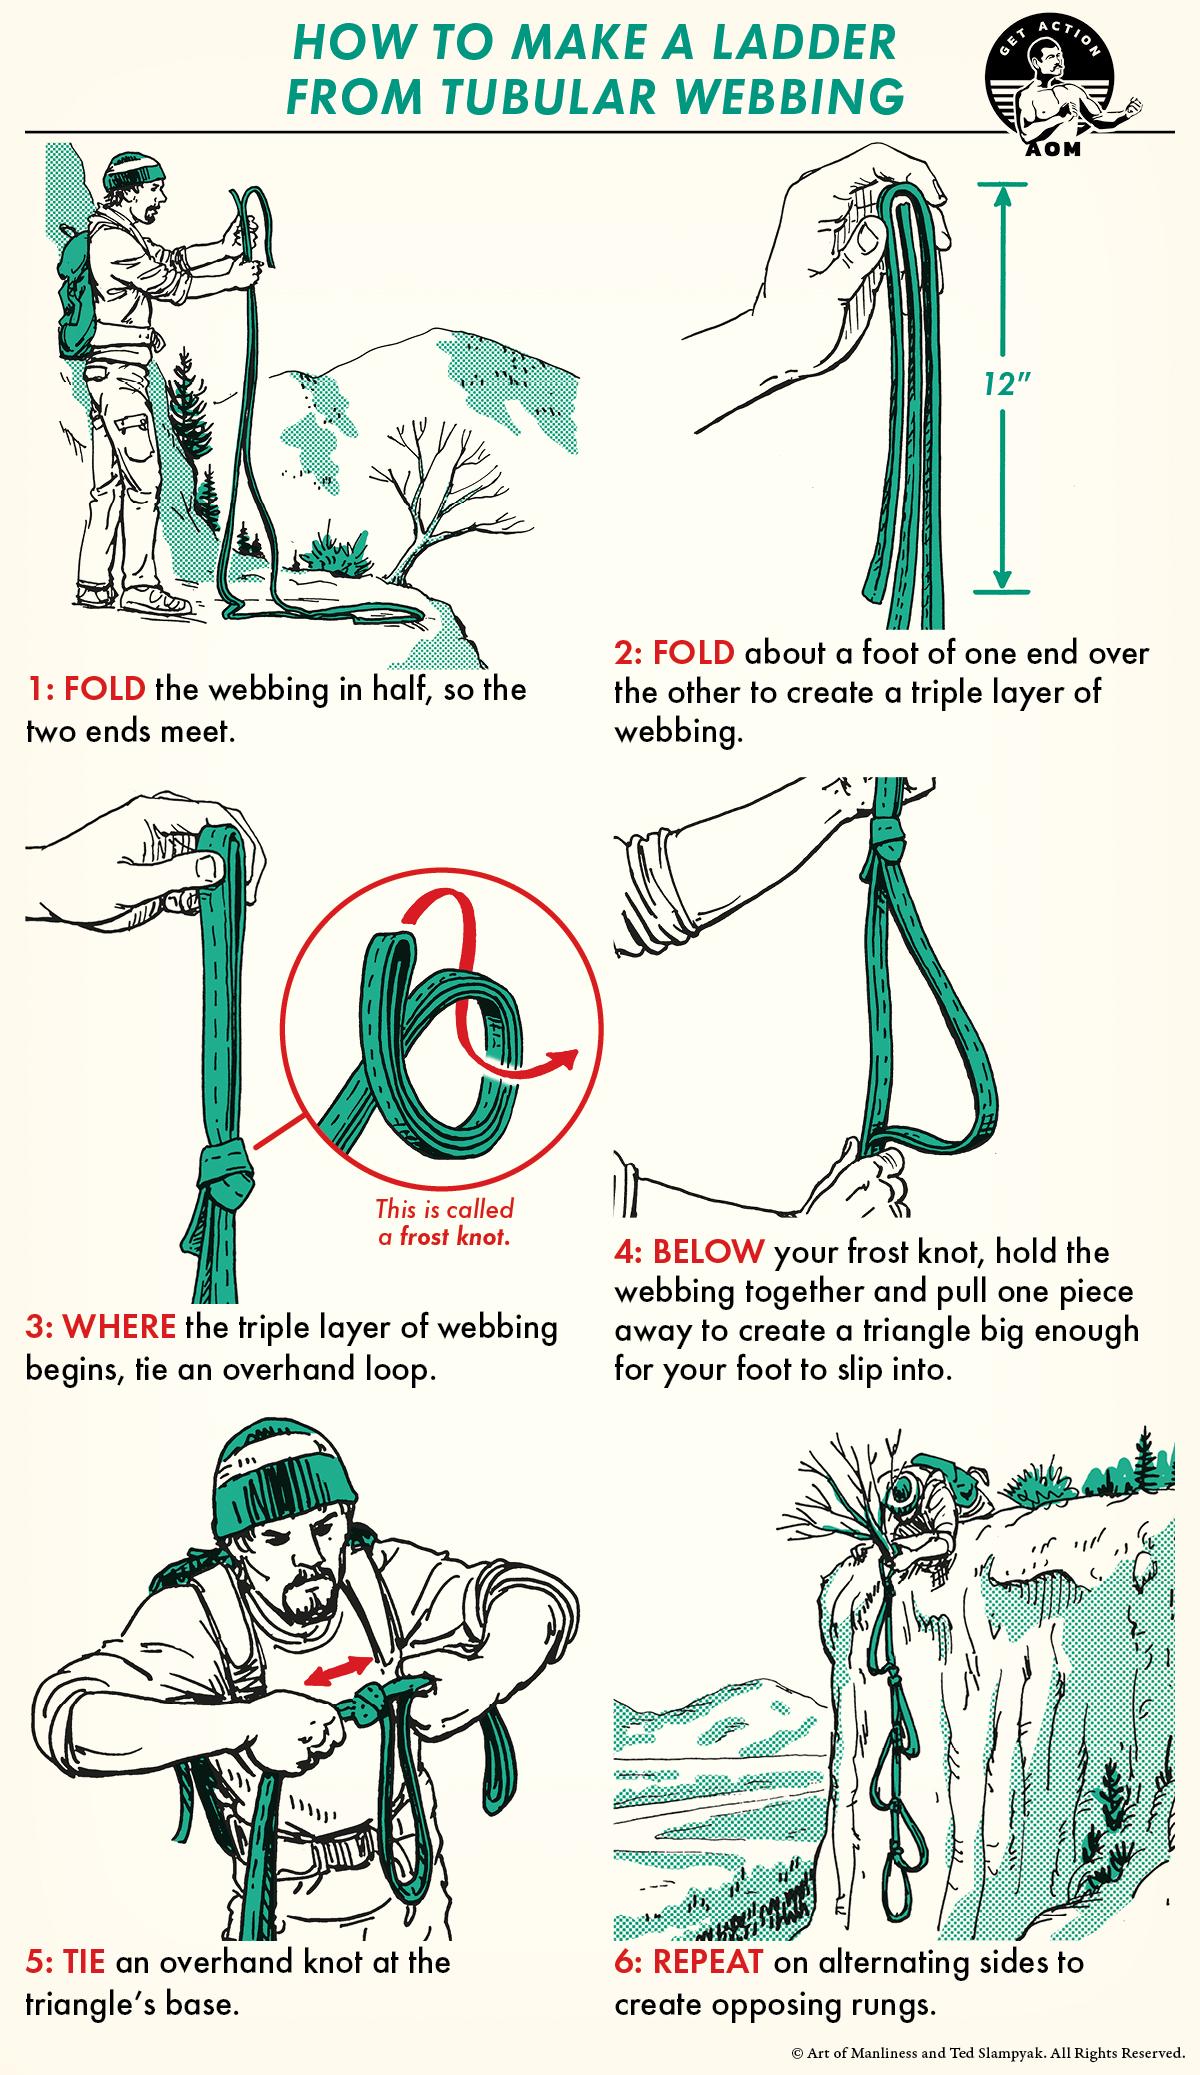 Six steps described to make a ladder from tubular webbing.